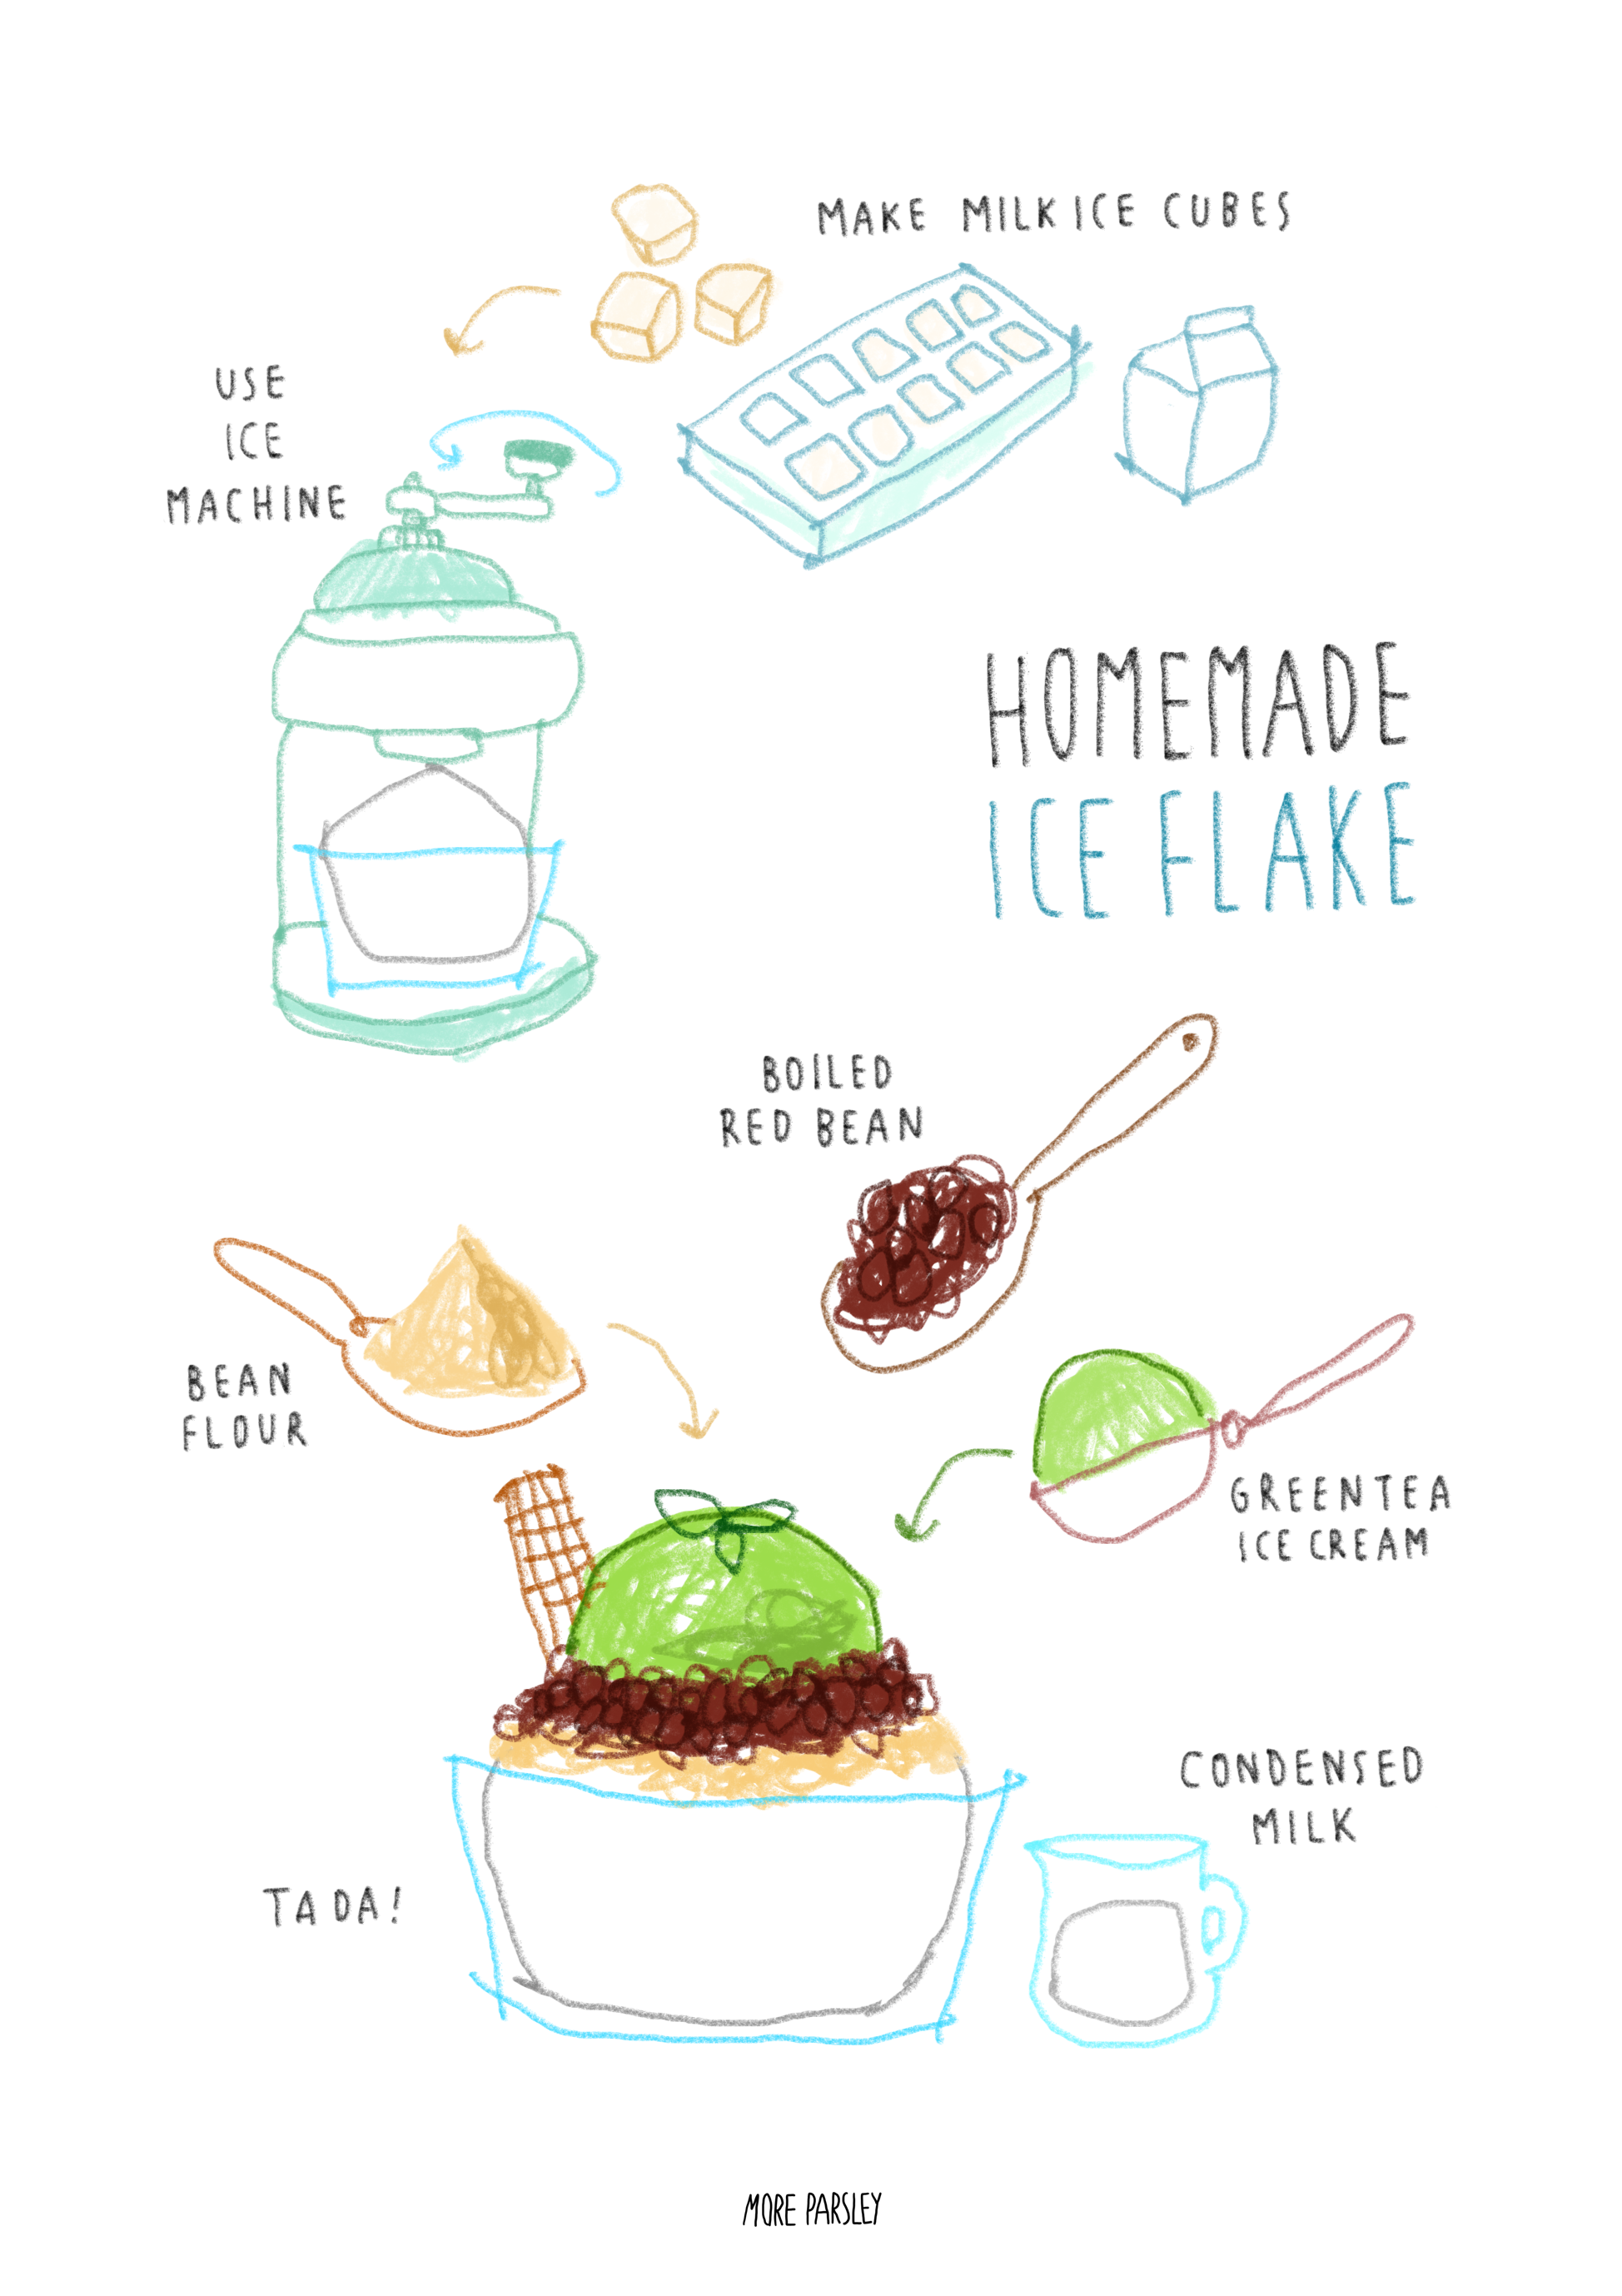 homemade iceflake recipe instagram @moreparsley_ | Panting ...